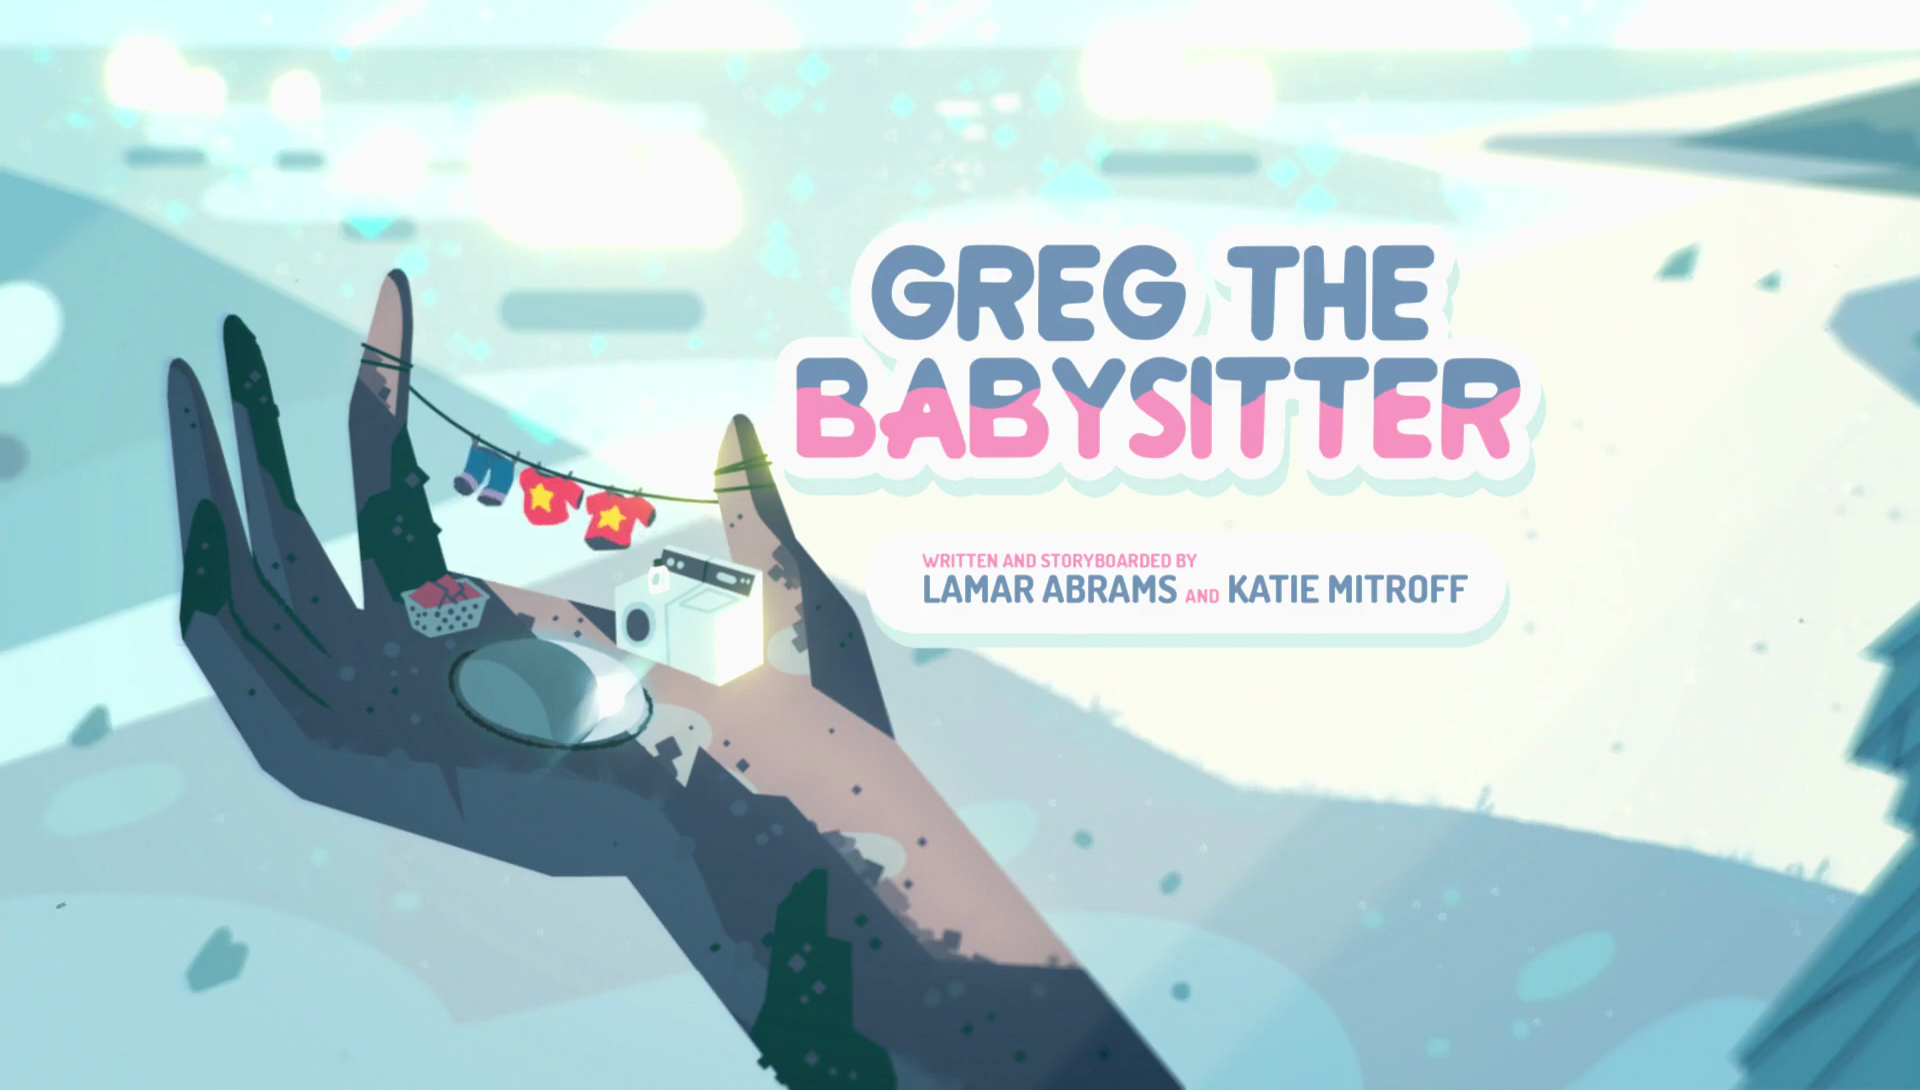 Greg the Babysitter/Gallery